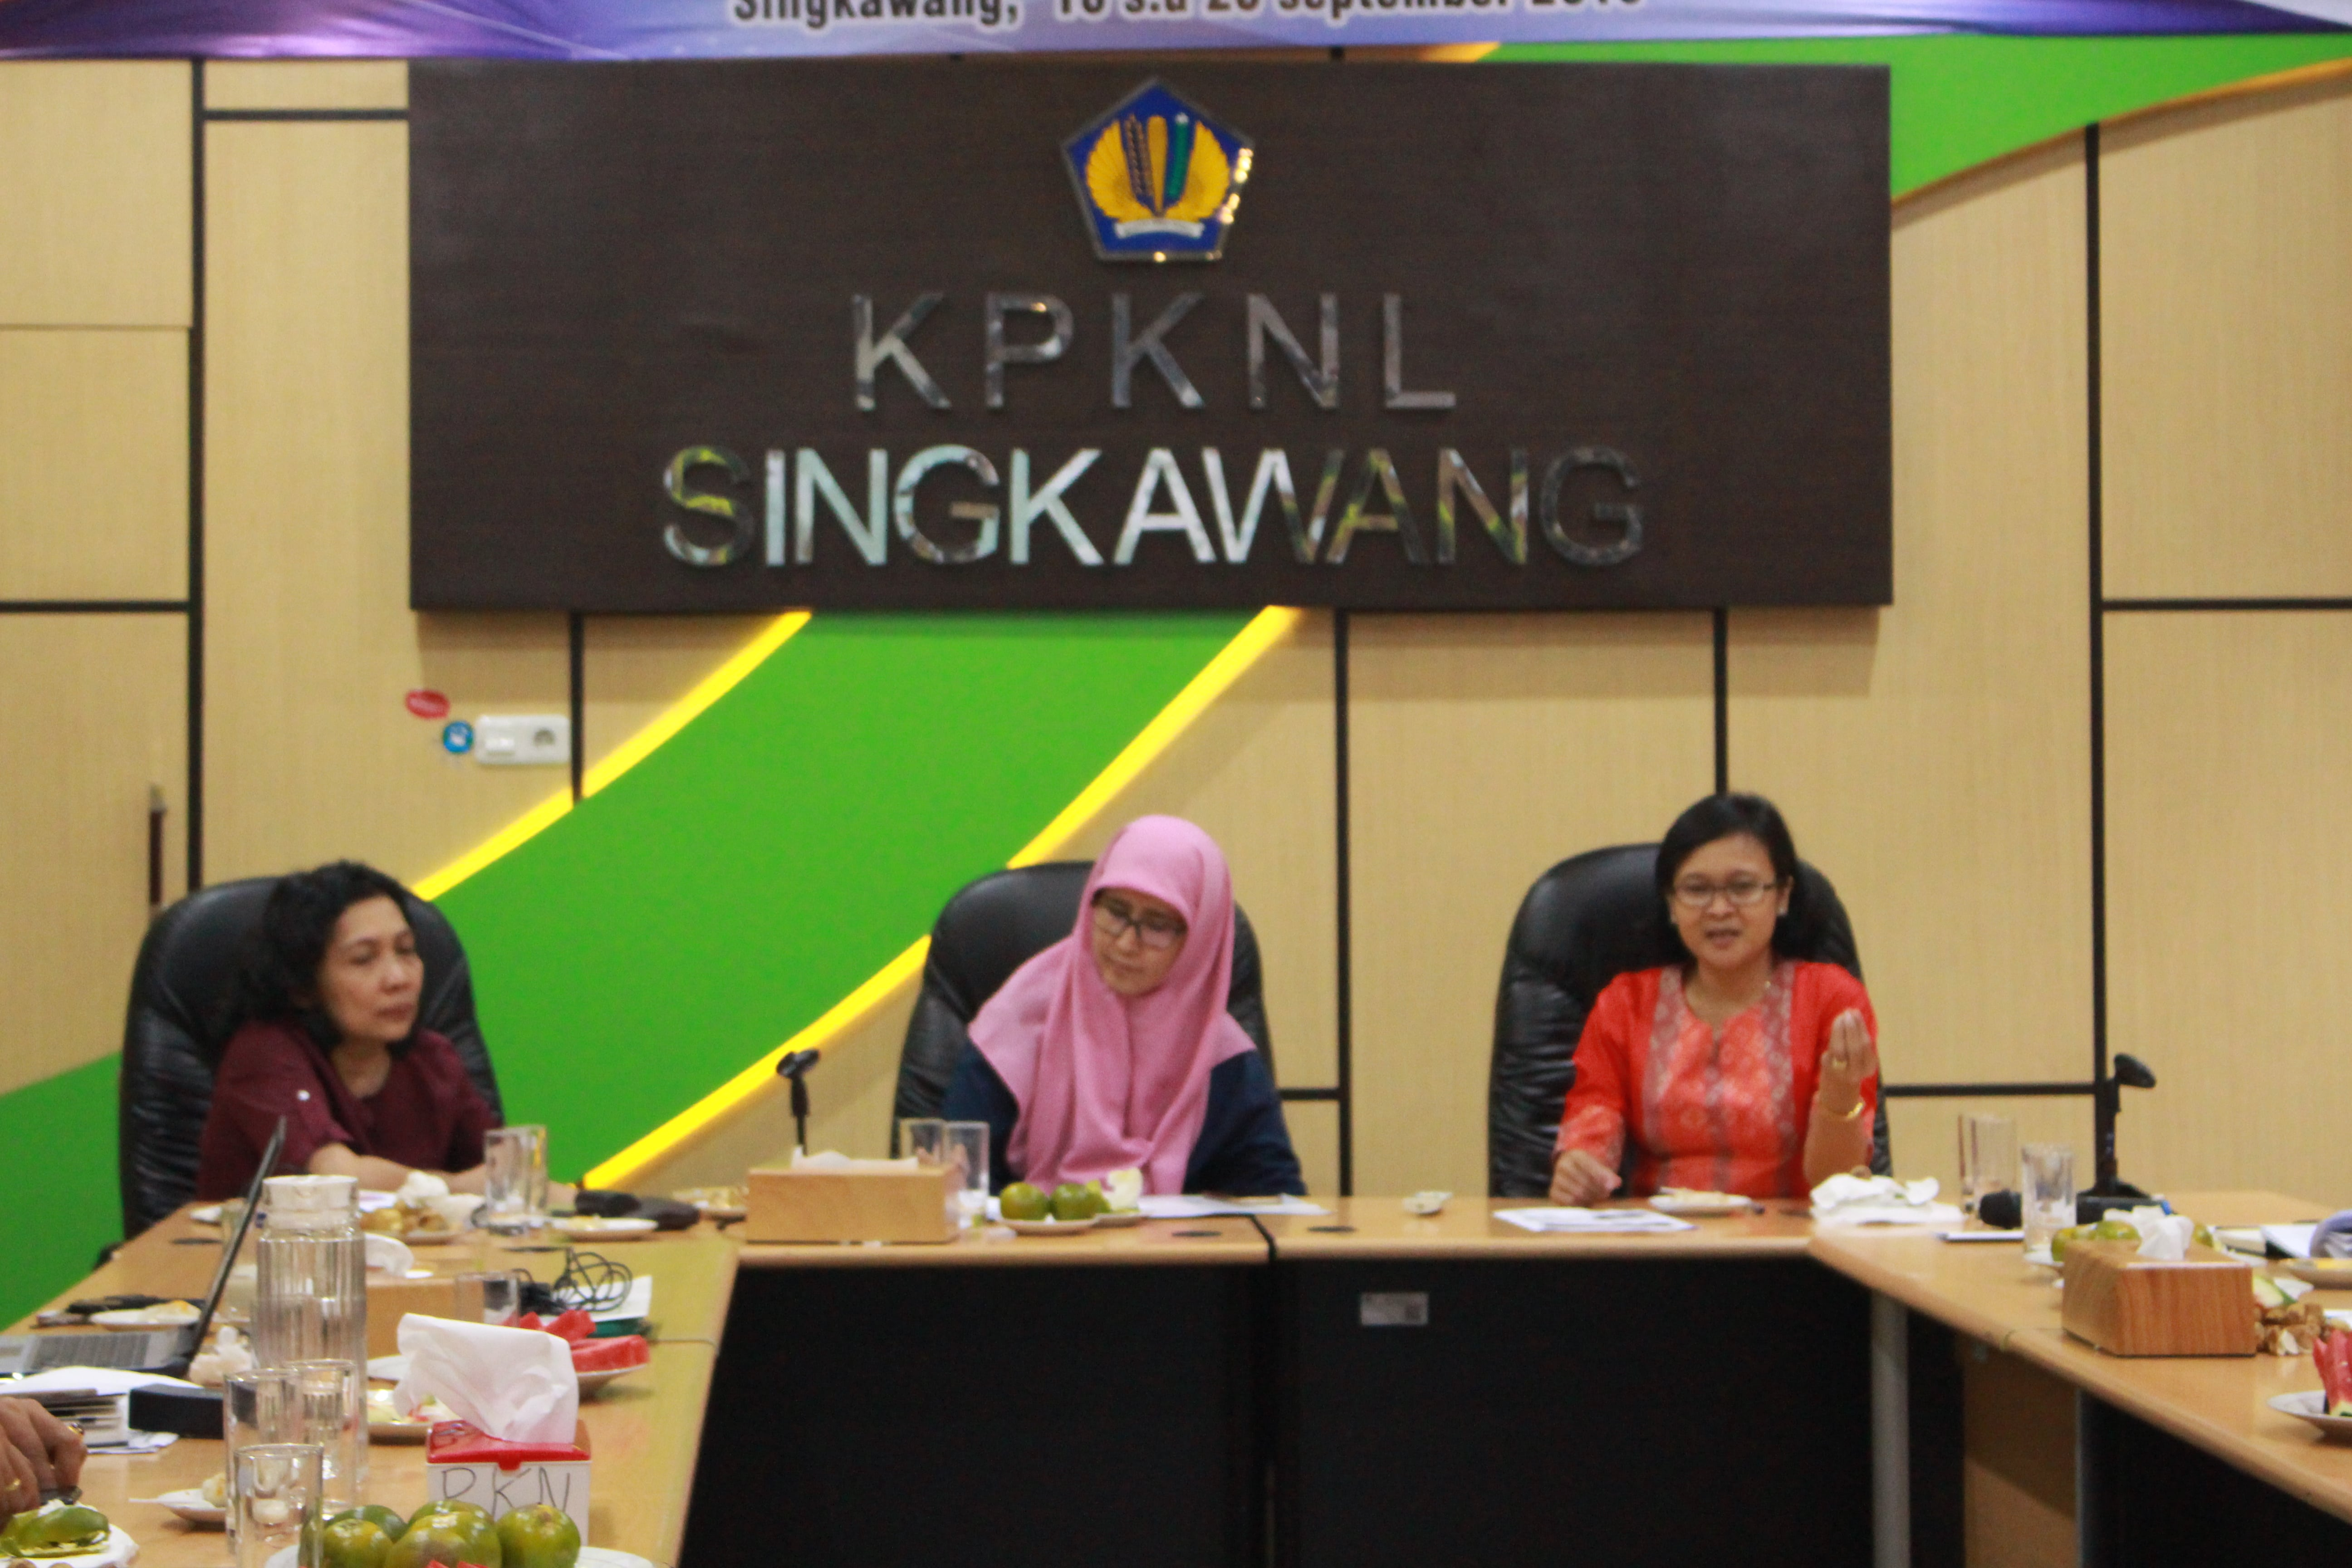 Kegiatan Evaluasi Peraturan Perundang - Undangan Tahun 2019 di KPKNL Singkawang